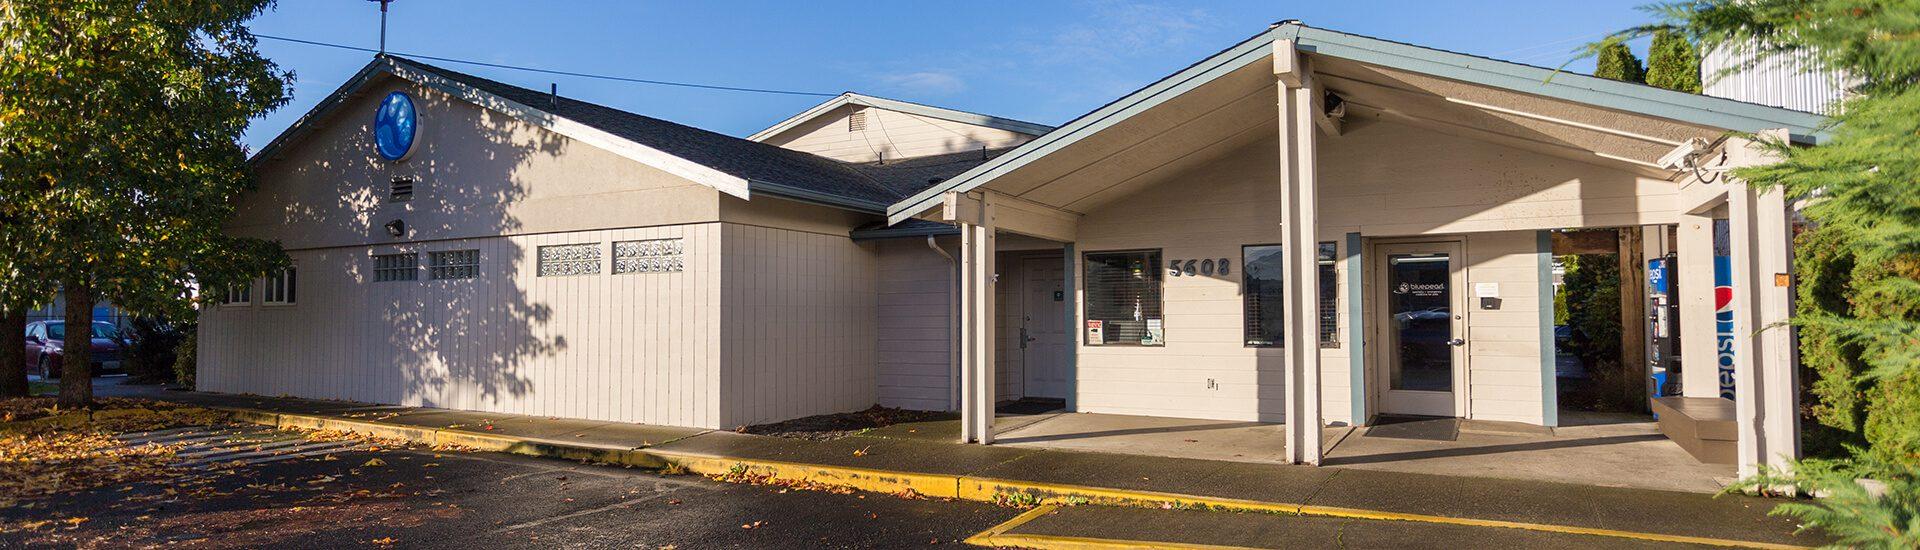 BluePearl Pet Hospital | Tacoma, WA | Emergency Vet